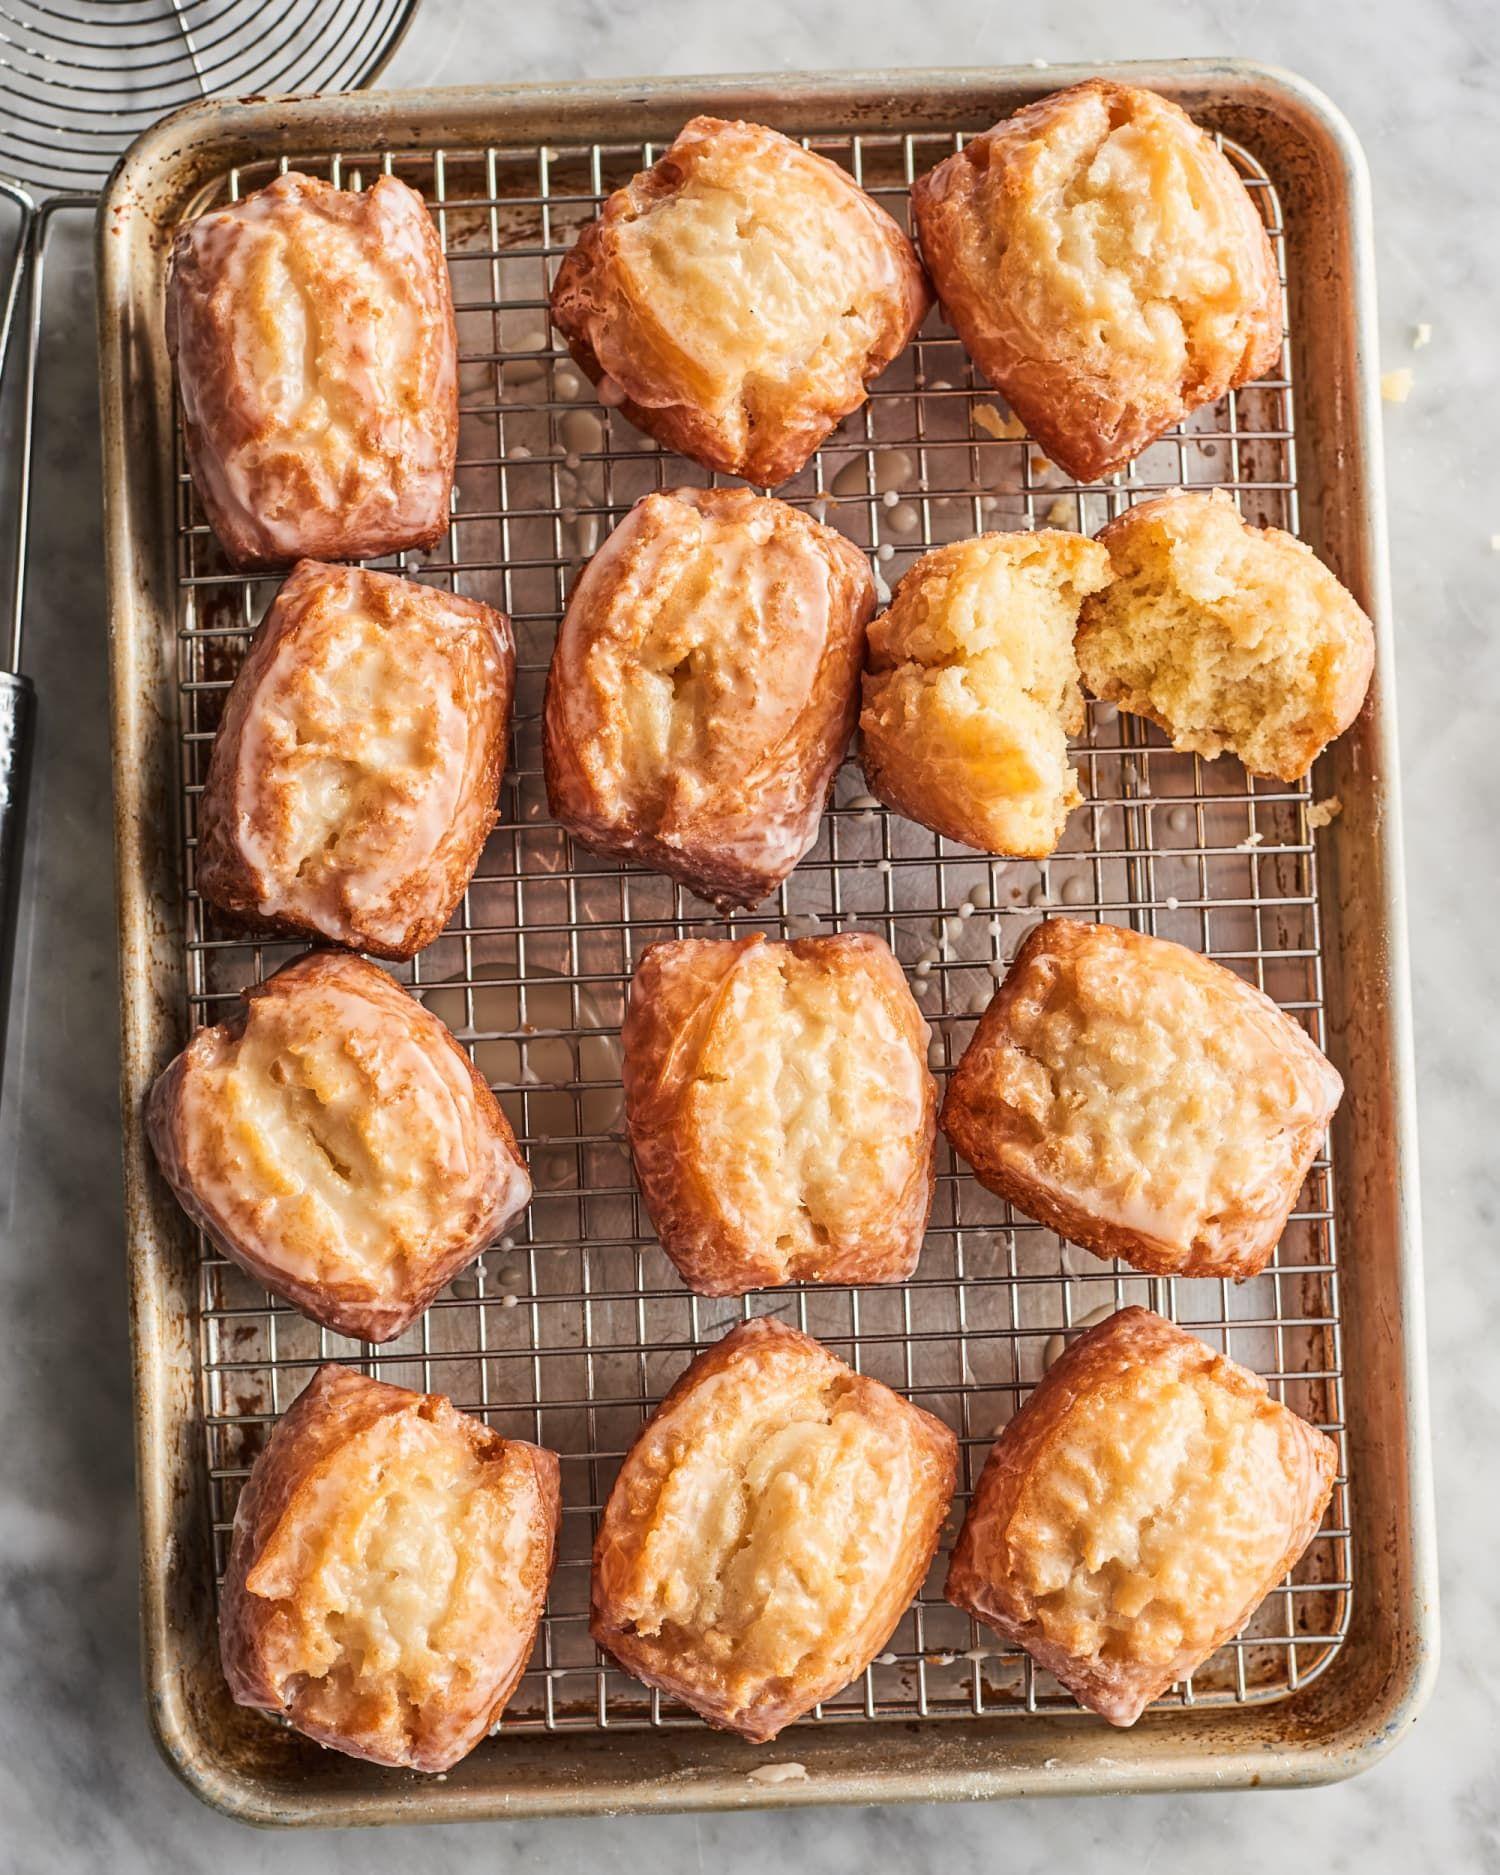 Old Fashioned Buttermilk Bar Donuts Are Crispy Fluffy Perfection Recipe In 2020 Buttermilk Bar Donut Recipe Donut Recipes Recipes